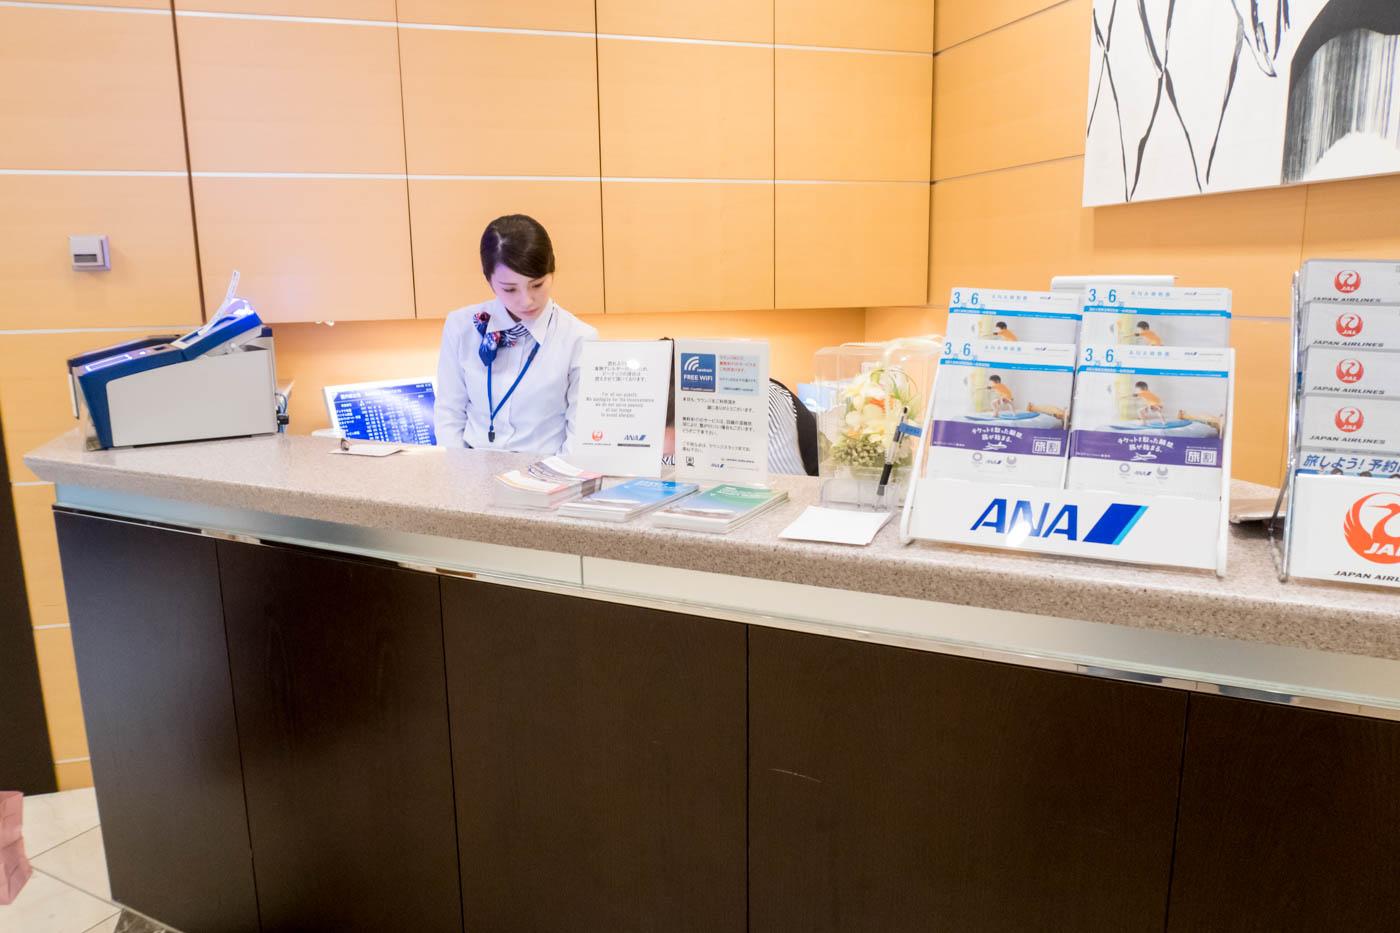 Centrair Airline Lounge Reception